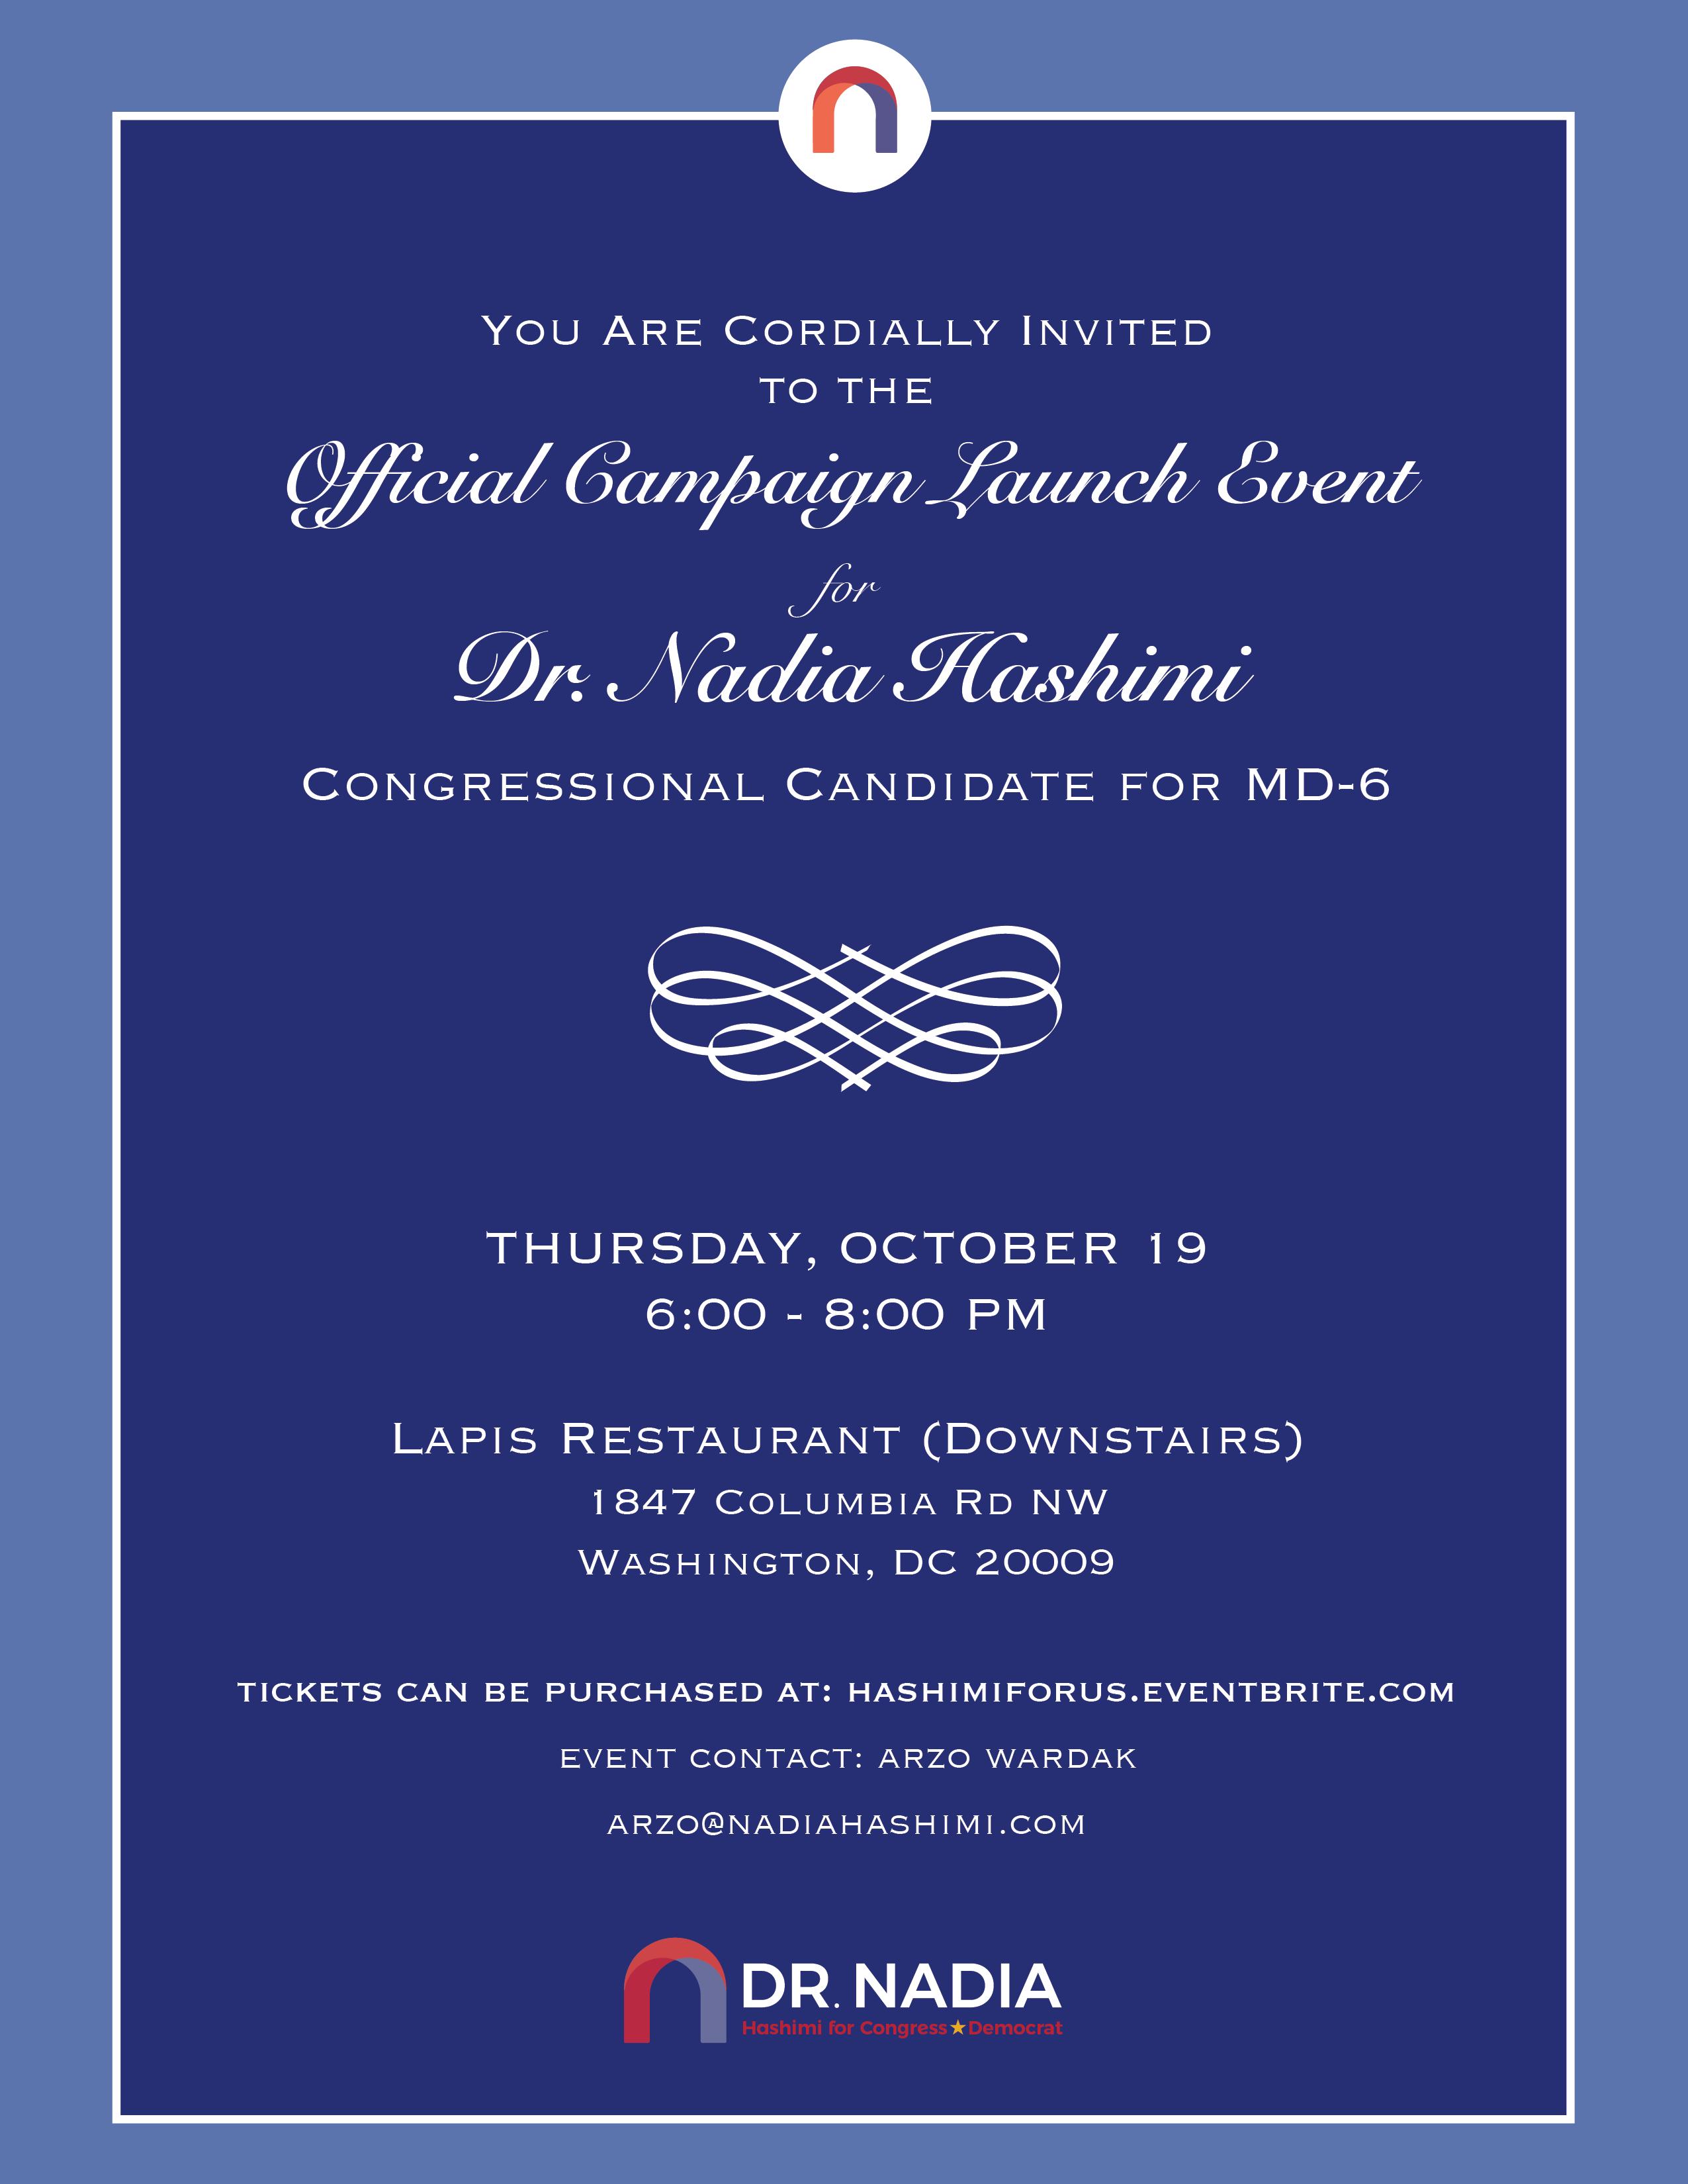 Official Invitation